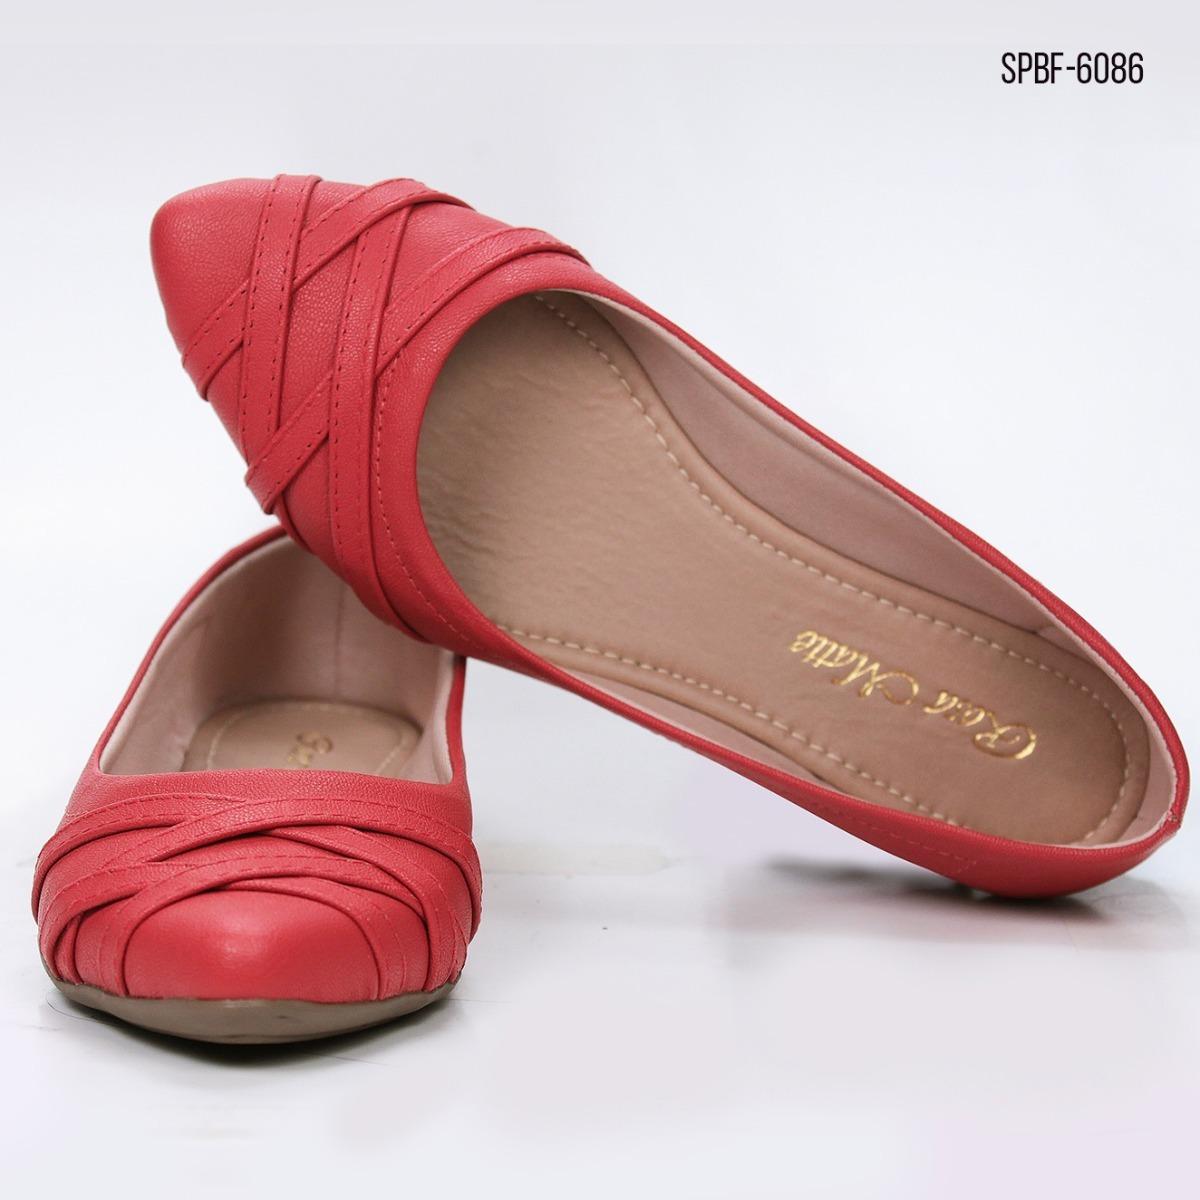 sapato feminino sapatilha bico fino vermelha cores barata. Carregando zoom. 985d1f33282b0